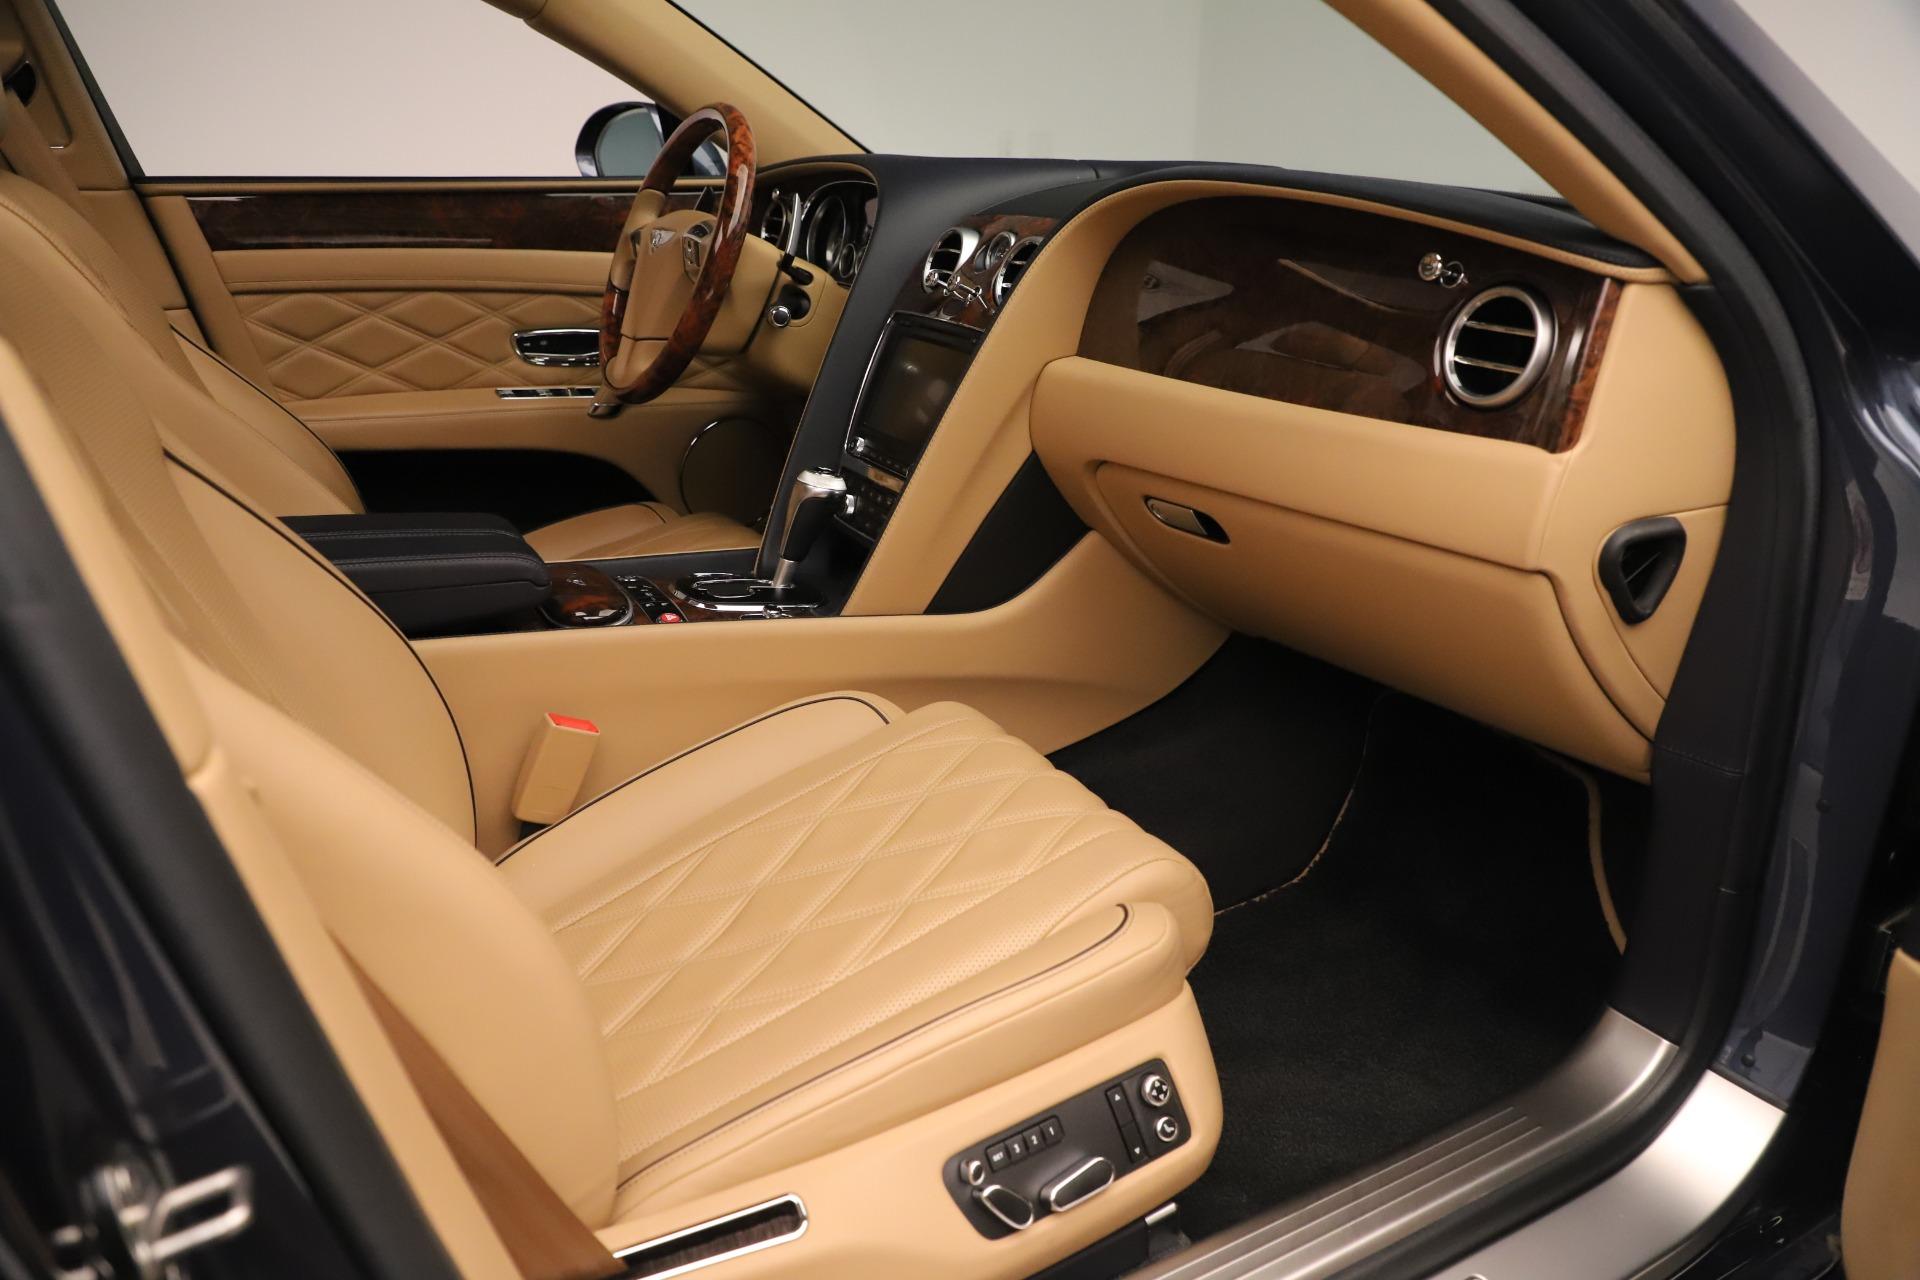 Used 2016 Bentley Flying Spur W12 For Sale In Westport, CT 3171_p26